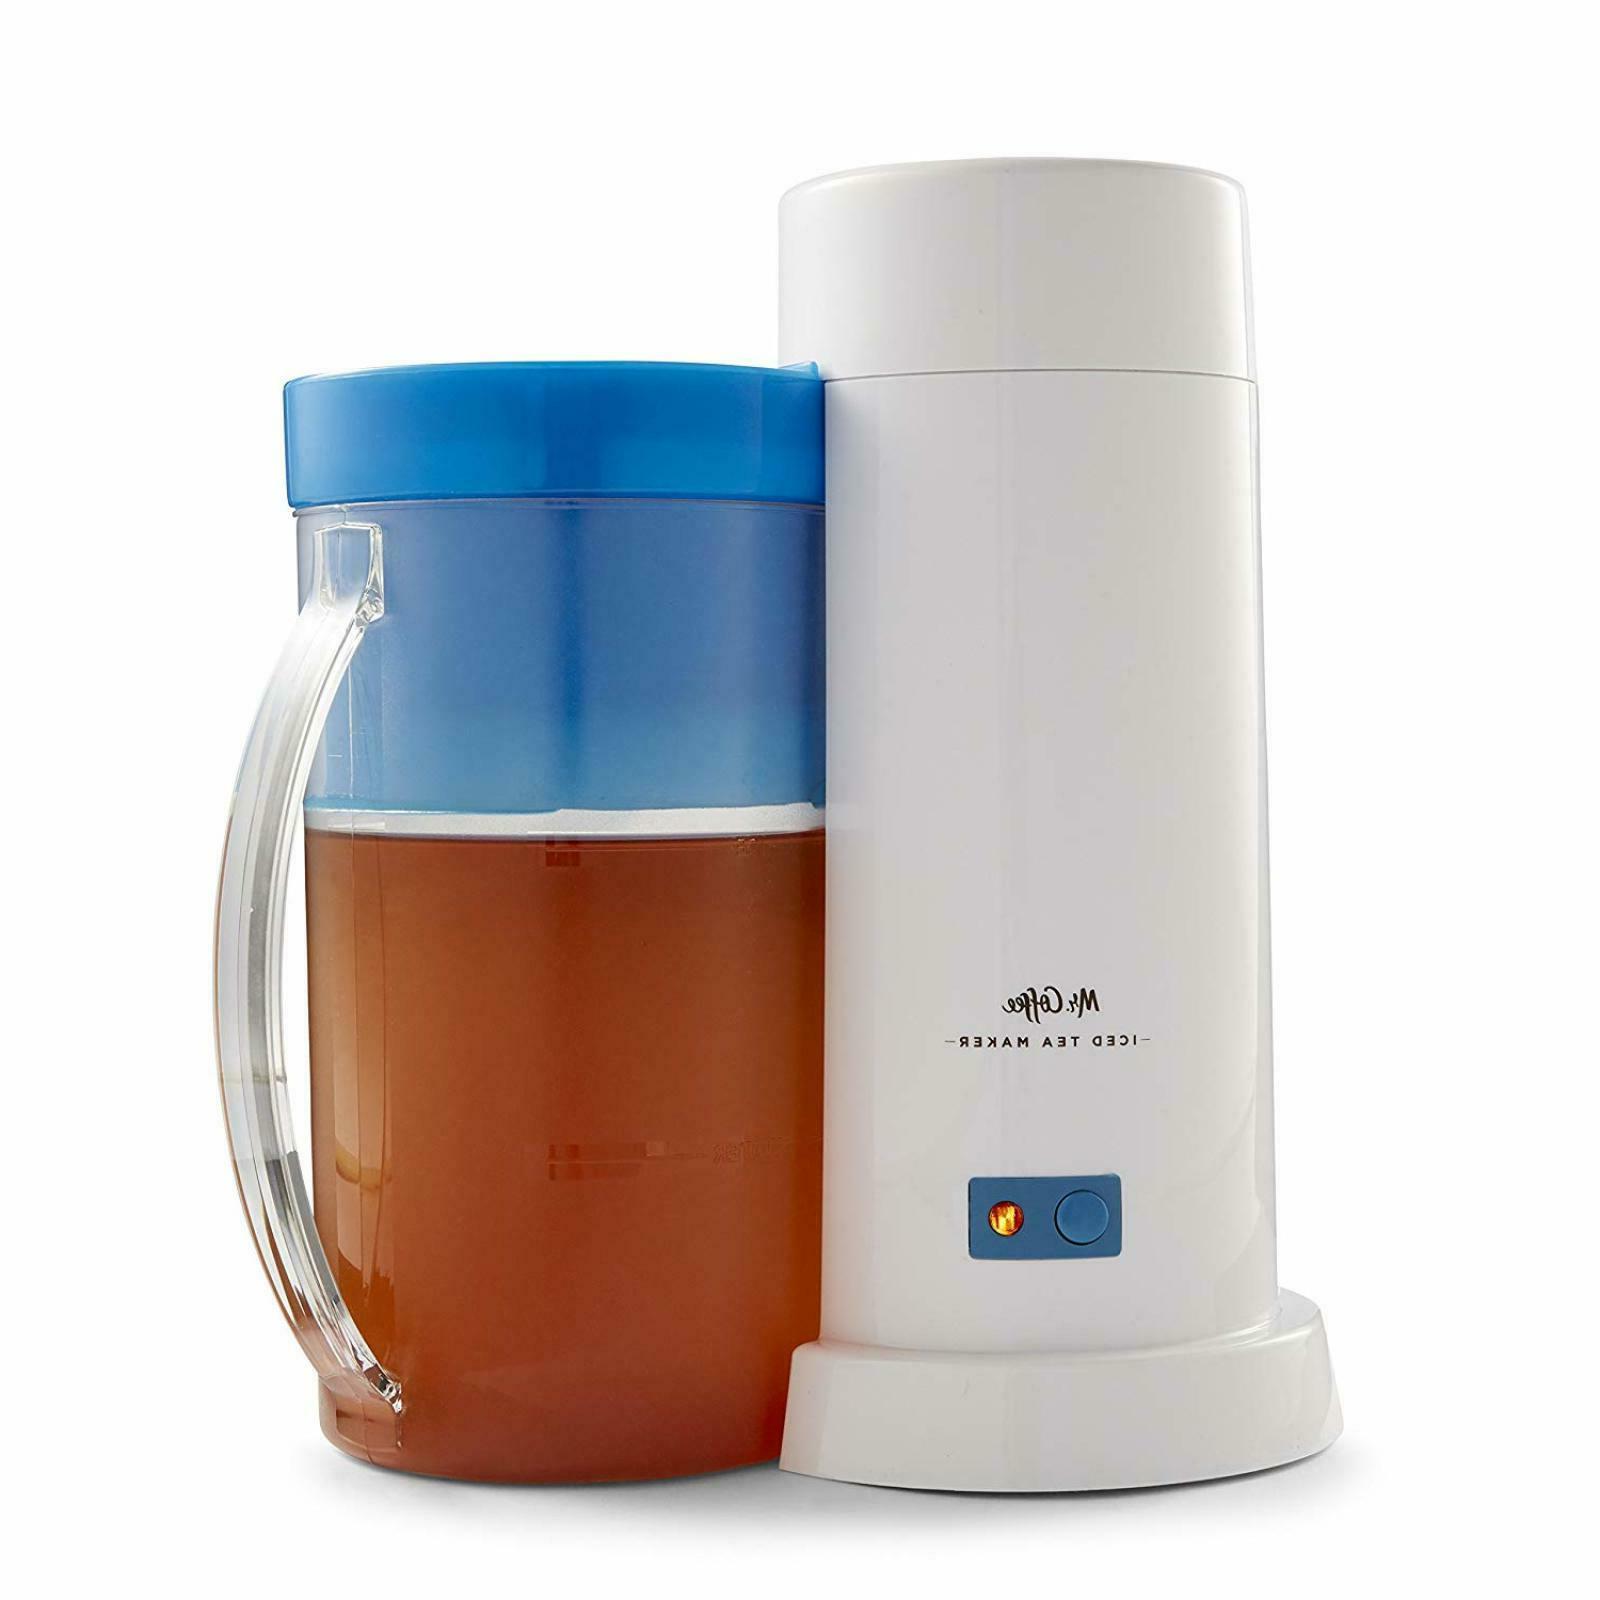 Mr. Coffee 2-Quart Iced Tea Coffee Maker Home Kitchen Small